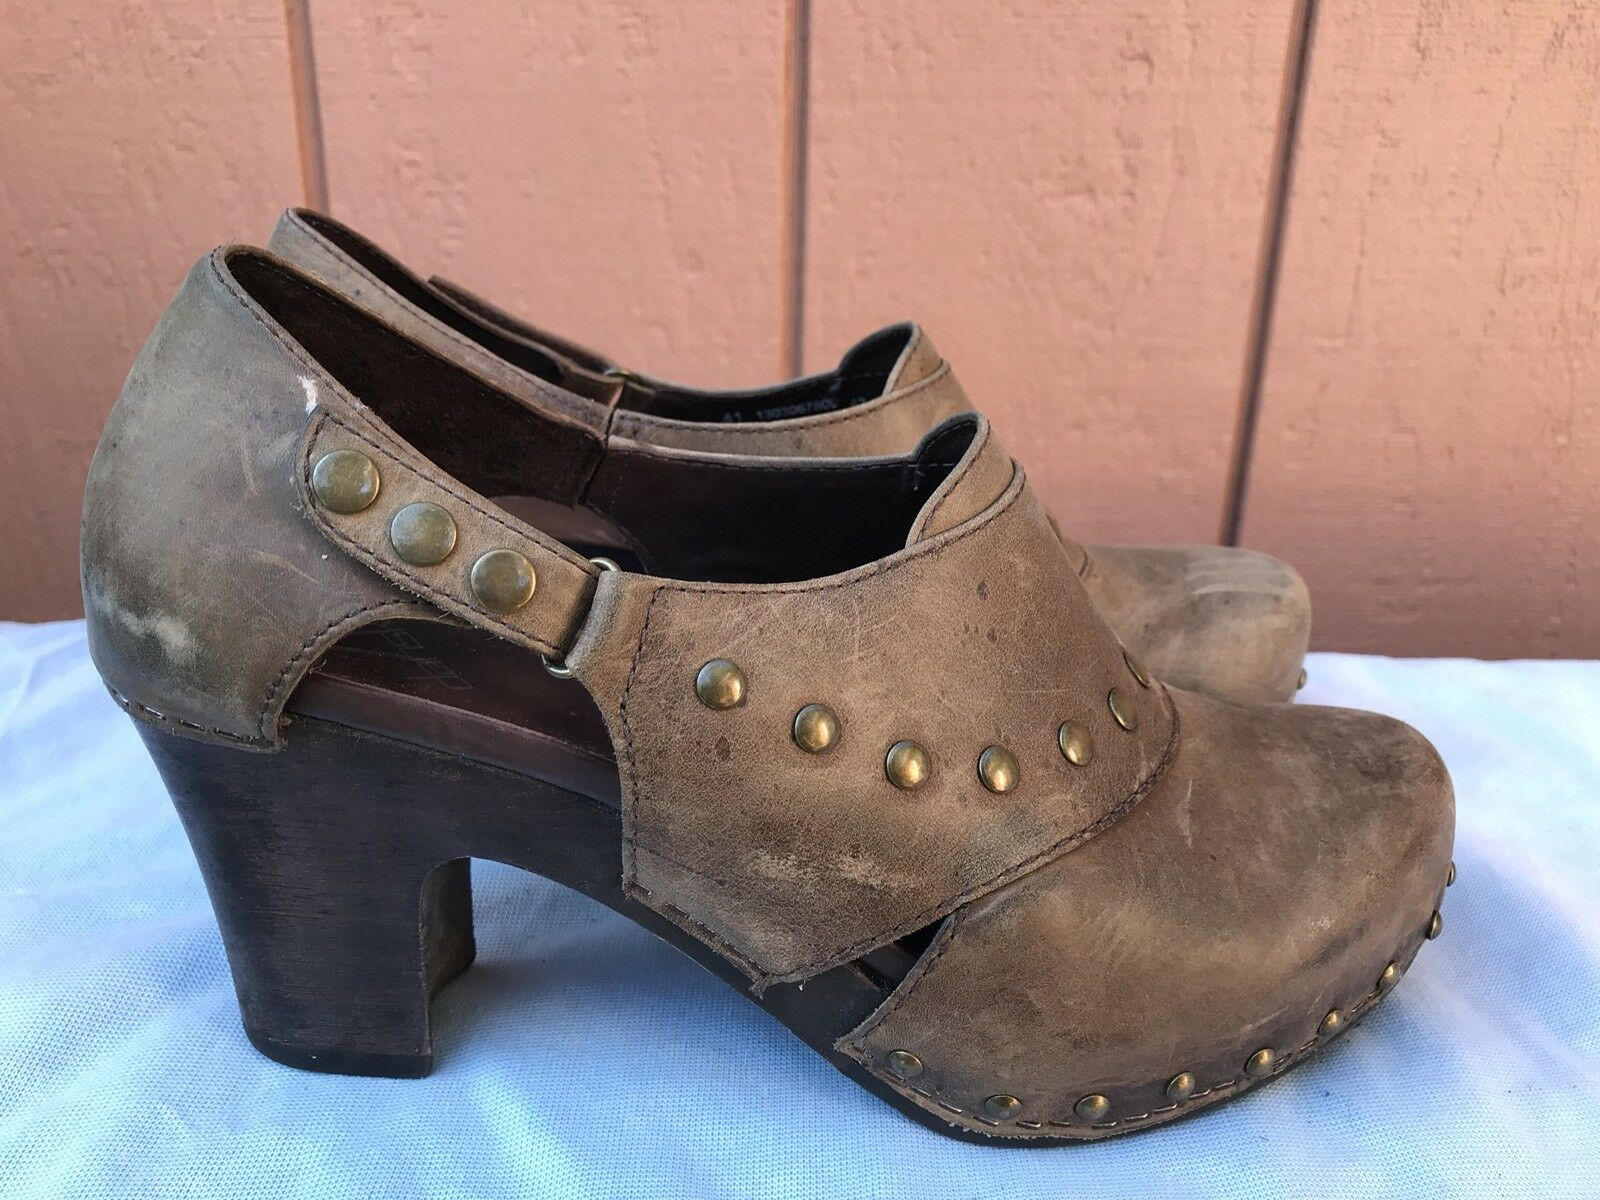 Dansko Femme Filles Chaussures Eur 41 US 10.5 - 11 Marron Huilé Cuir Pompe stappled A3